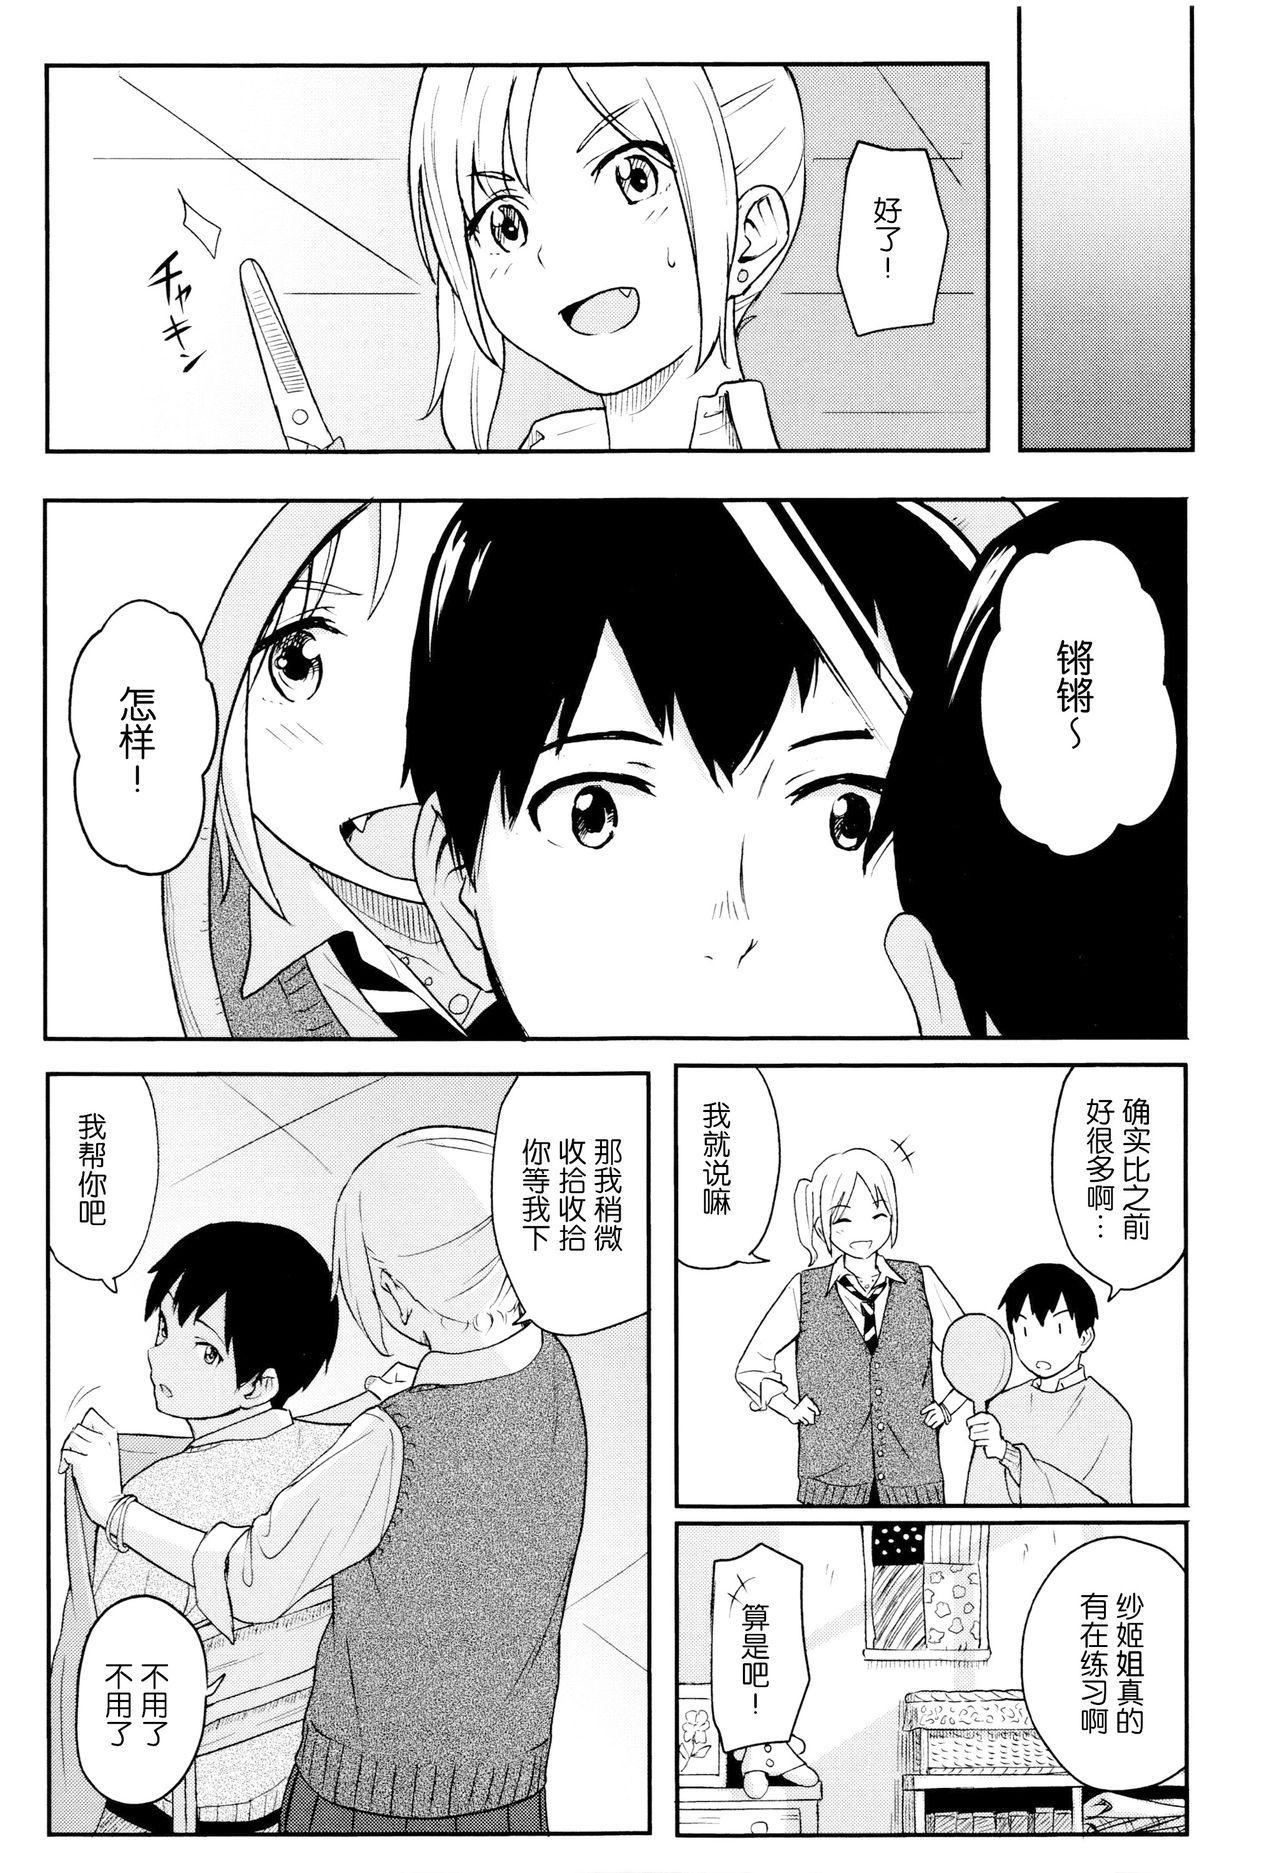 Tokubetsu na Mainichi - Special daily 51